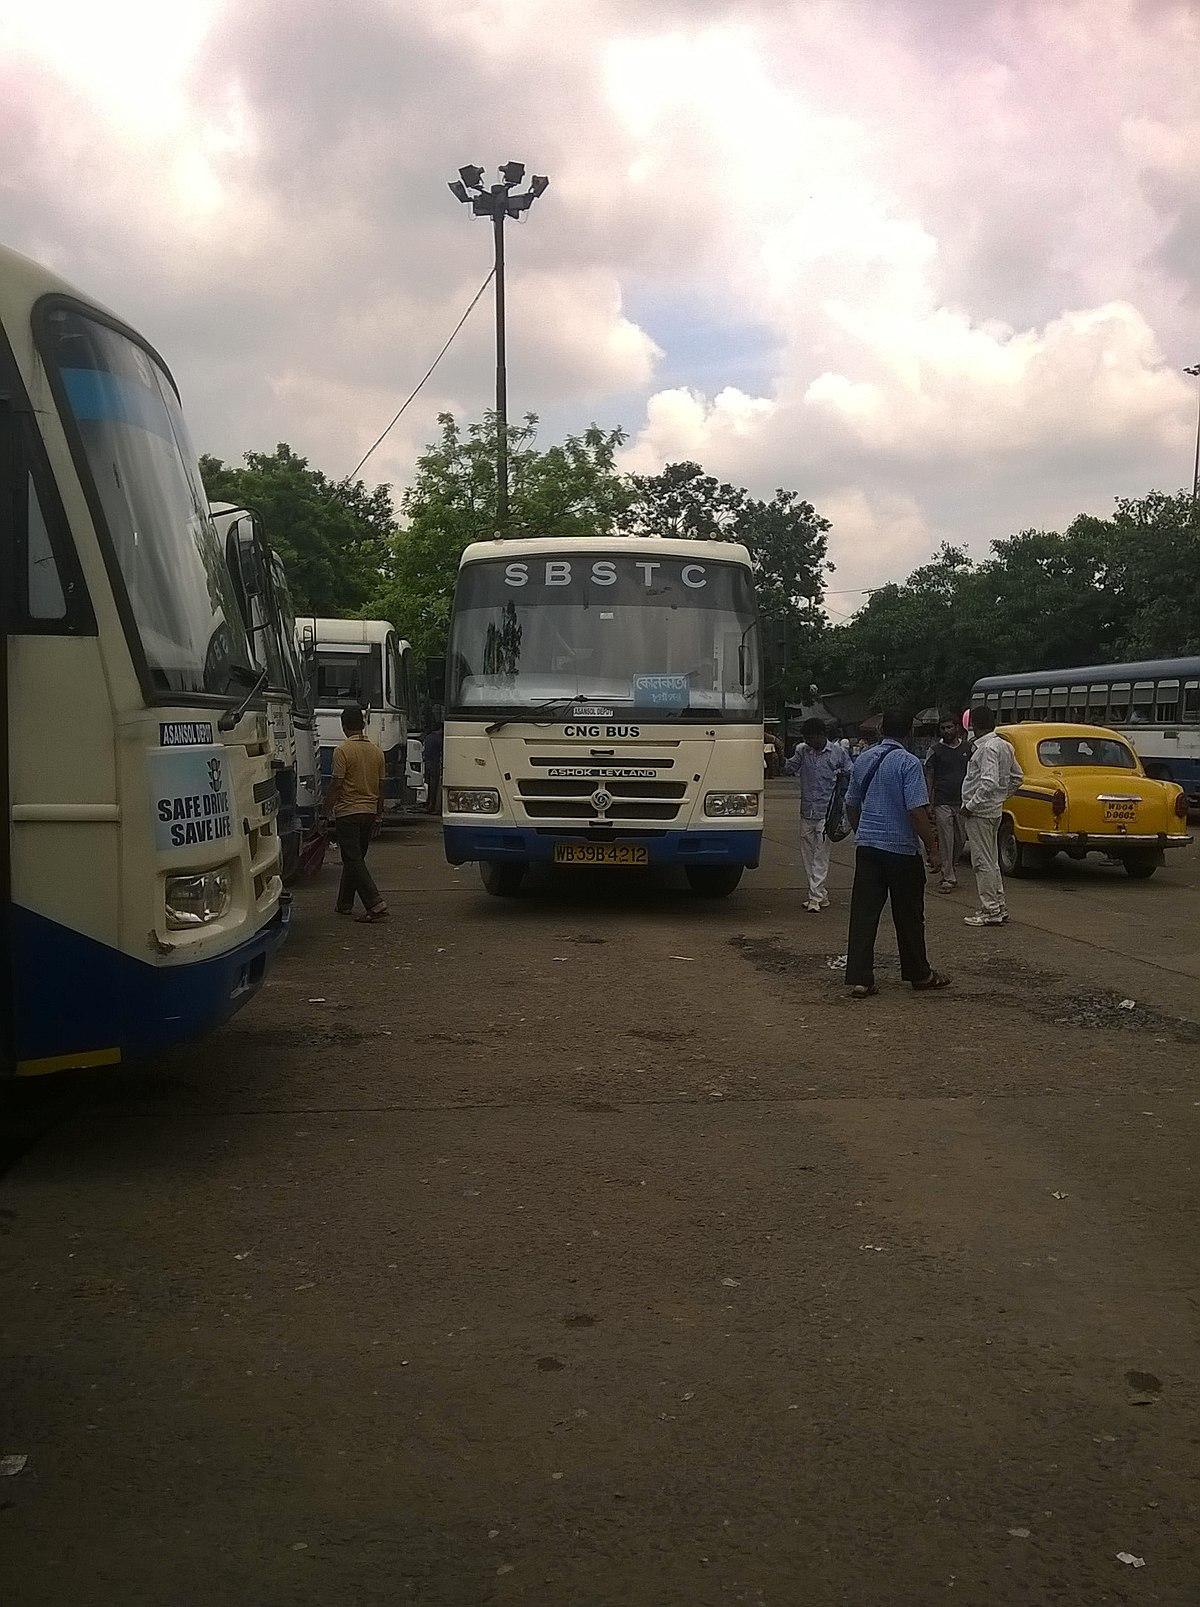 South Bengal State Transport Corporation - Wikipedia